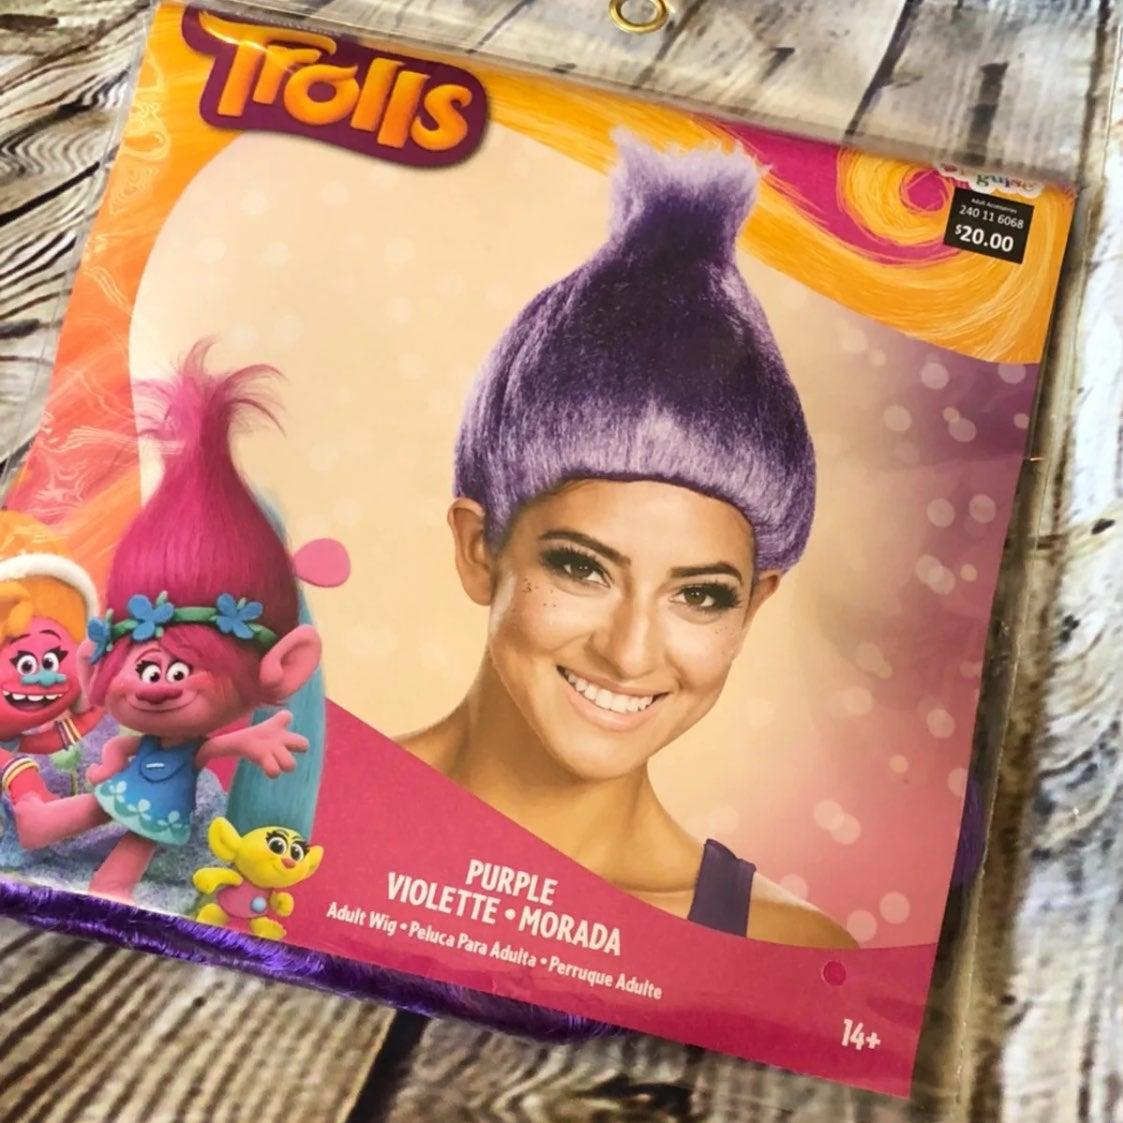 Disguise Purple Trolls Wig Halloween